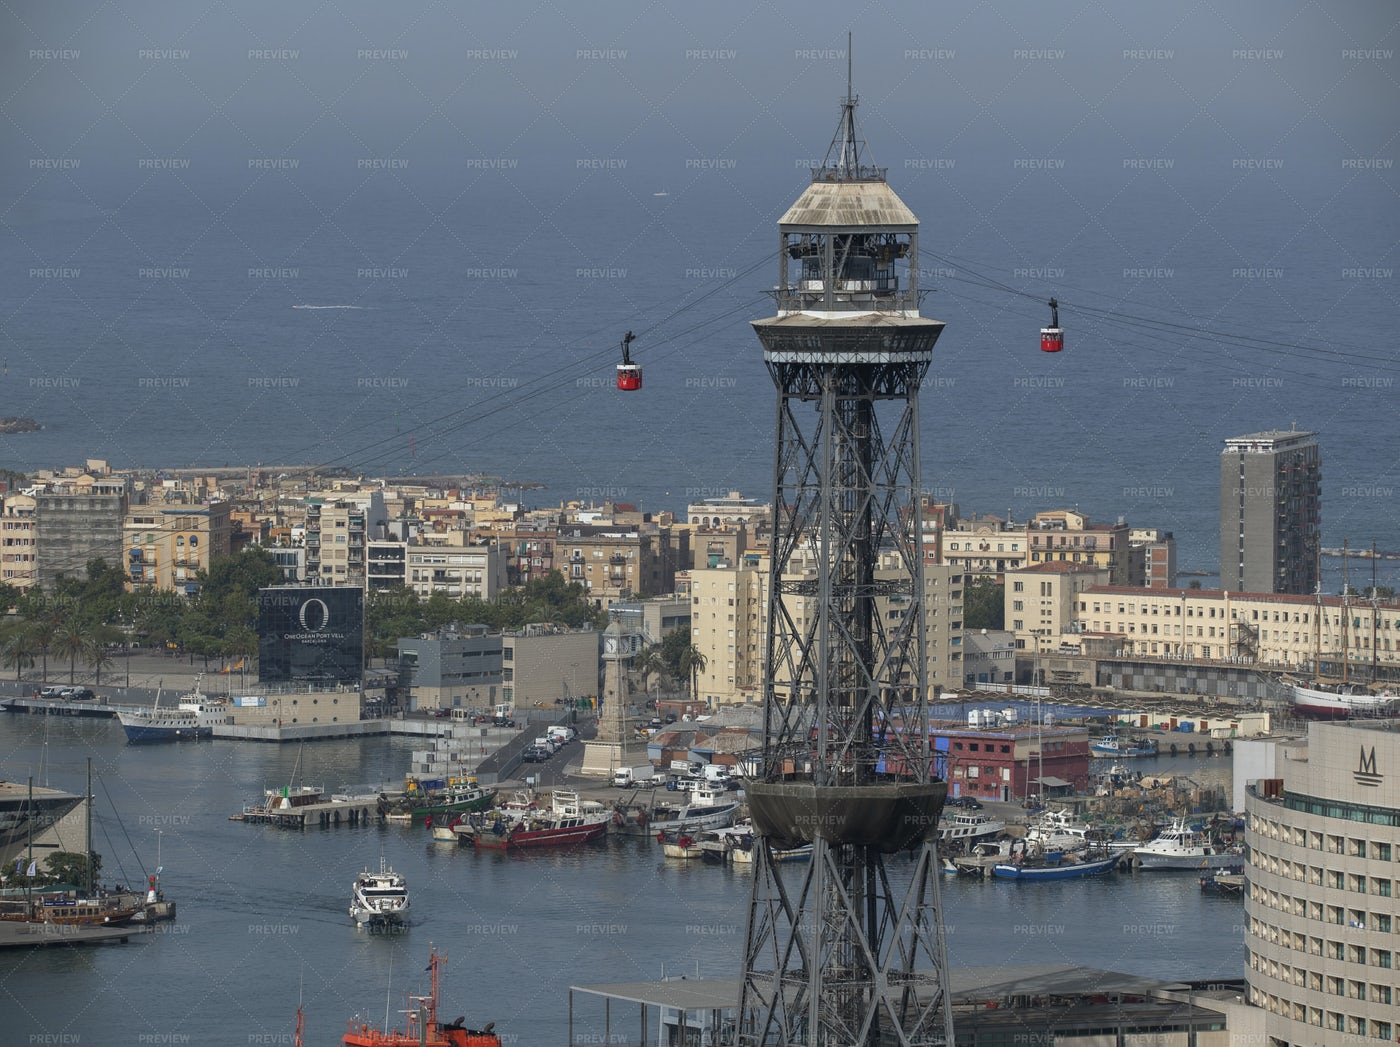 Barcelona Port And Mountains: Stock Photos